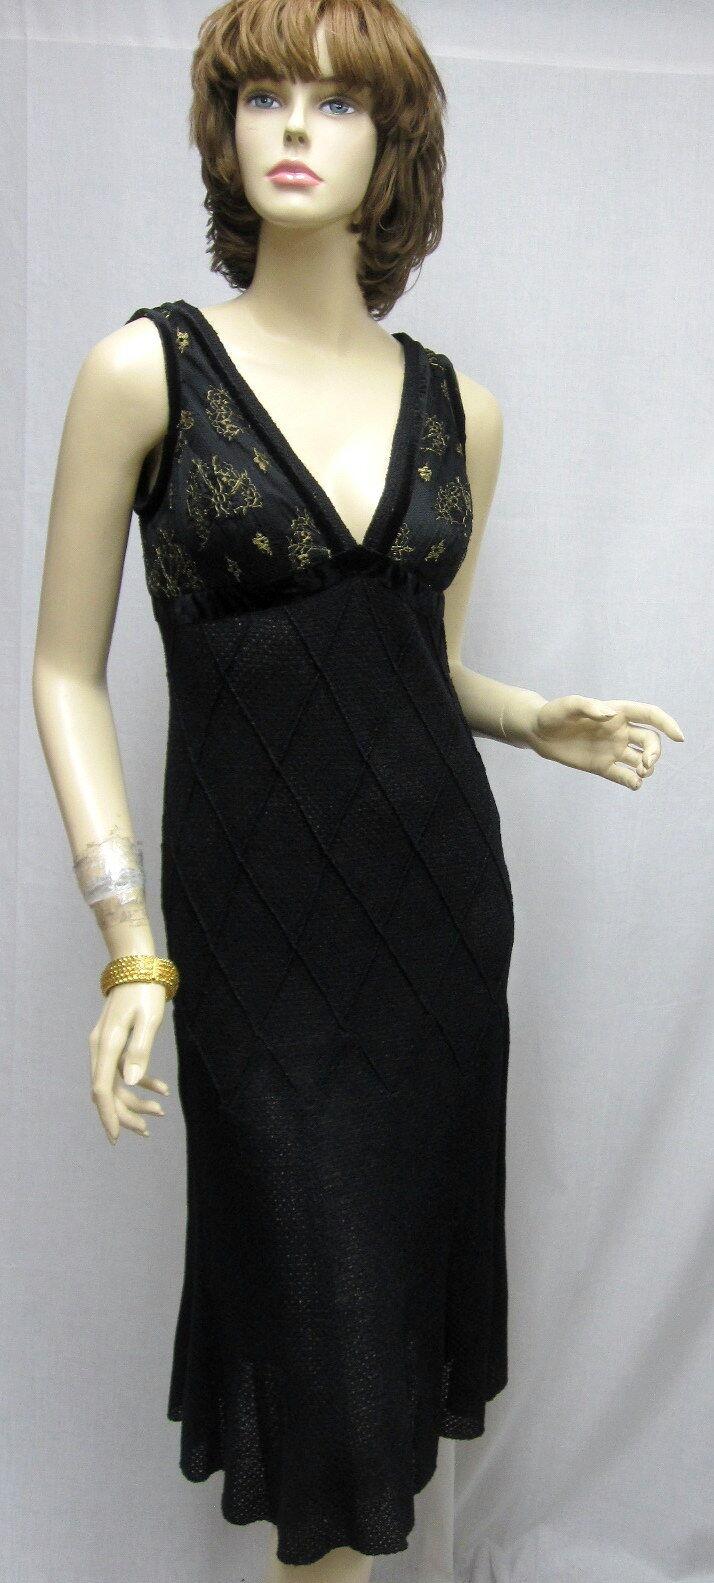 St John Knit Noche Nuevo Con Etiquetas Hermosa  Negro Brillo Vestido Talla 4 RT  1495  mejor servicio